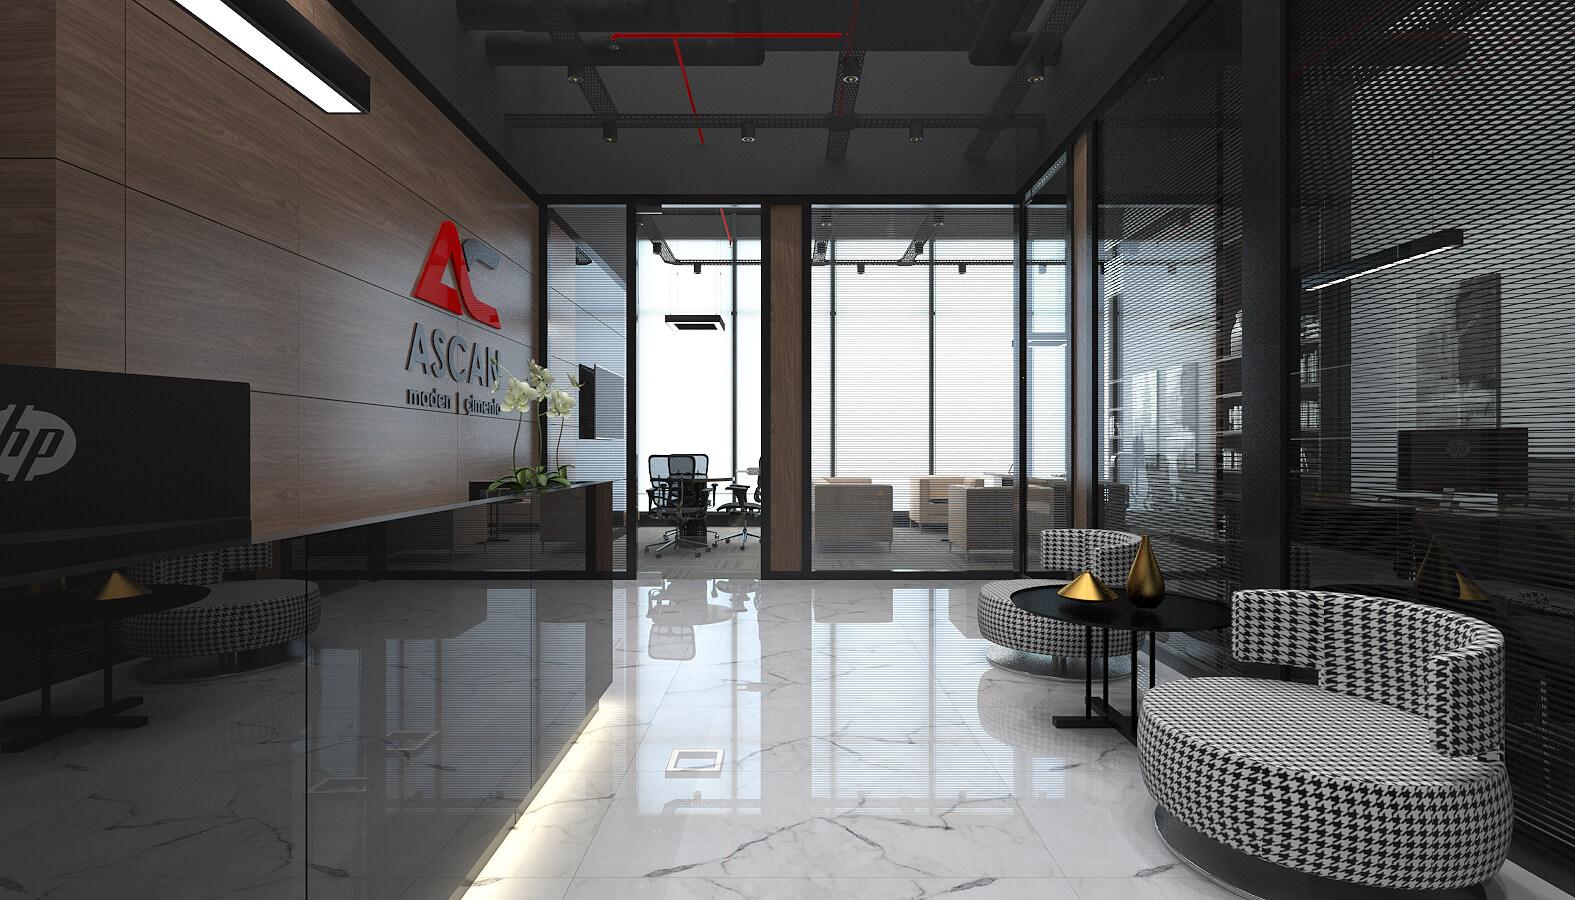 ofis mimari 3502 Ascan Maden Çimento Ofisler